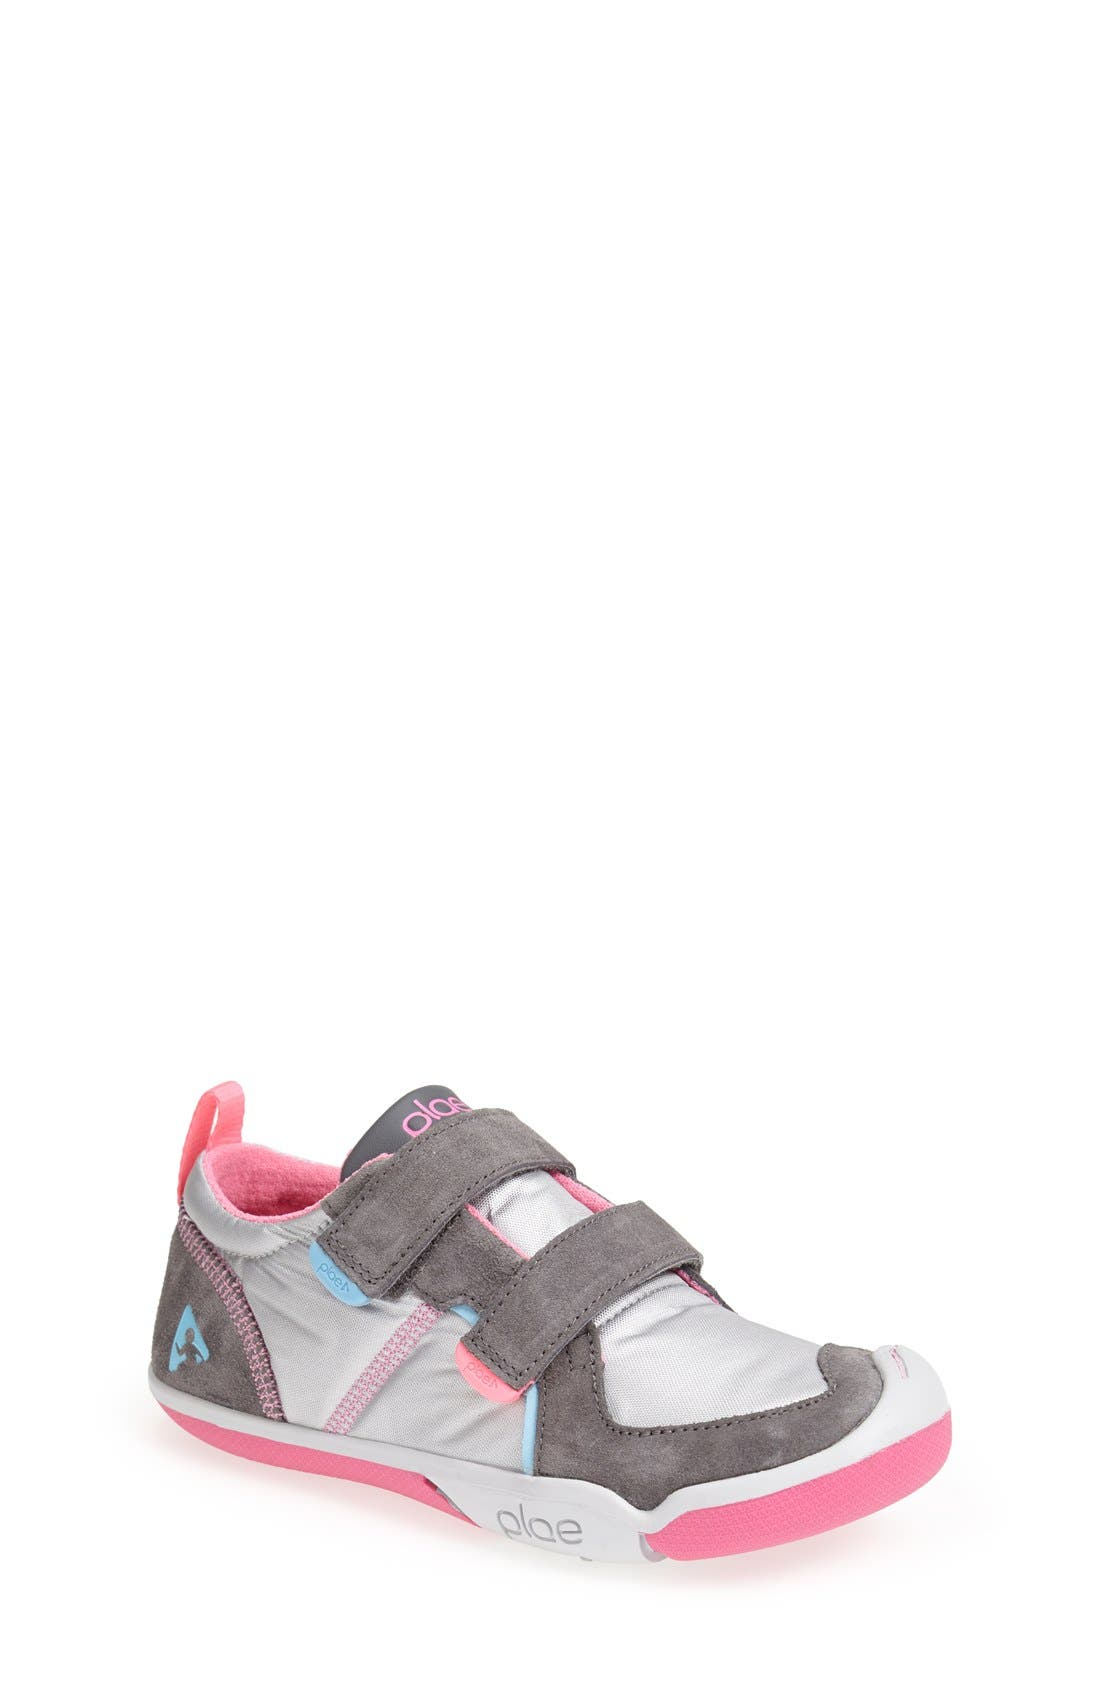 PLAE 'Ty' Customizable Sneaker (Toddler & Little Kid)